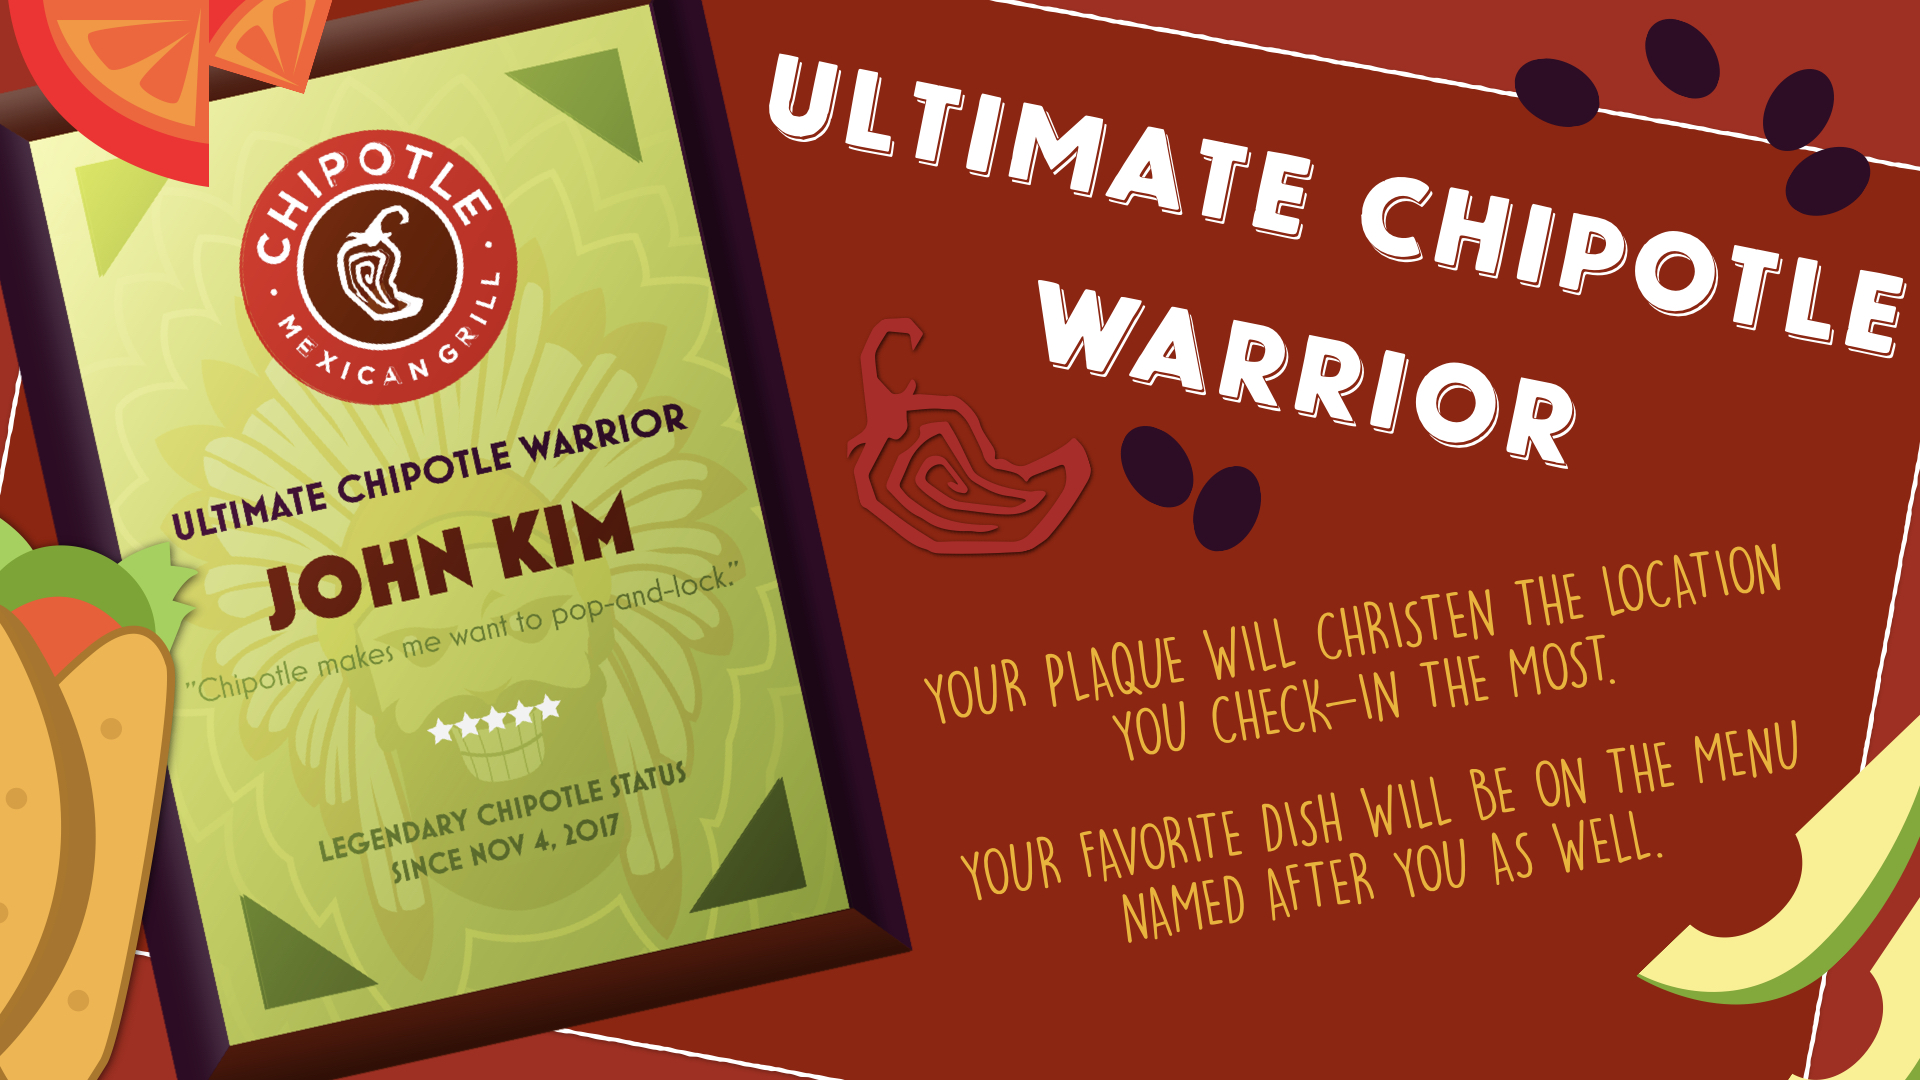 Burrito Warrior Final copy for Adam .007.jpeg